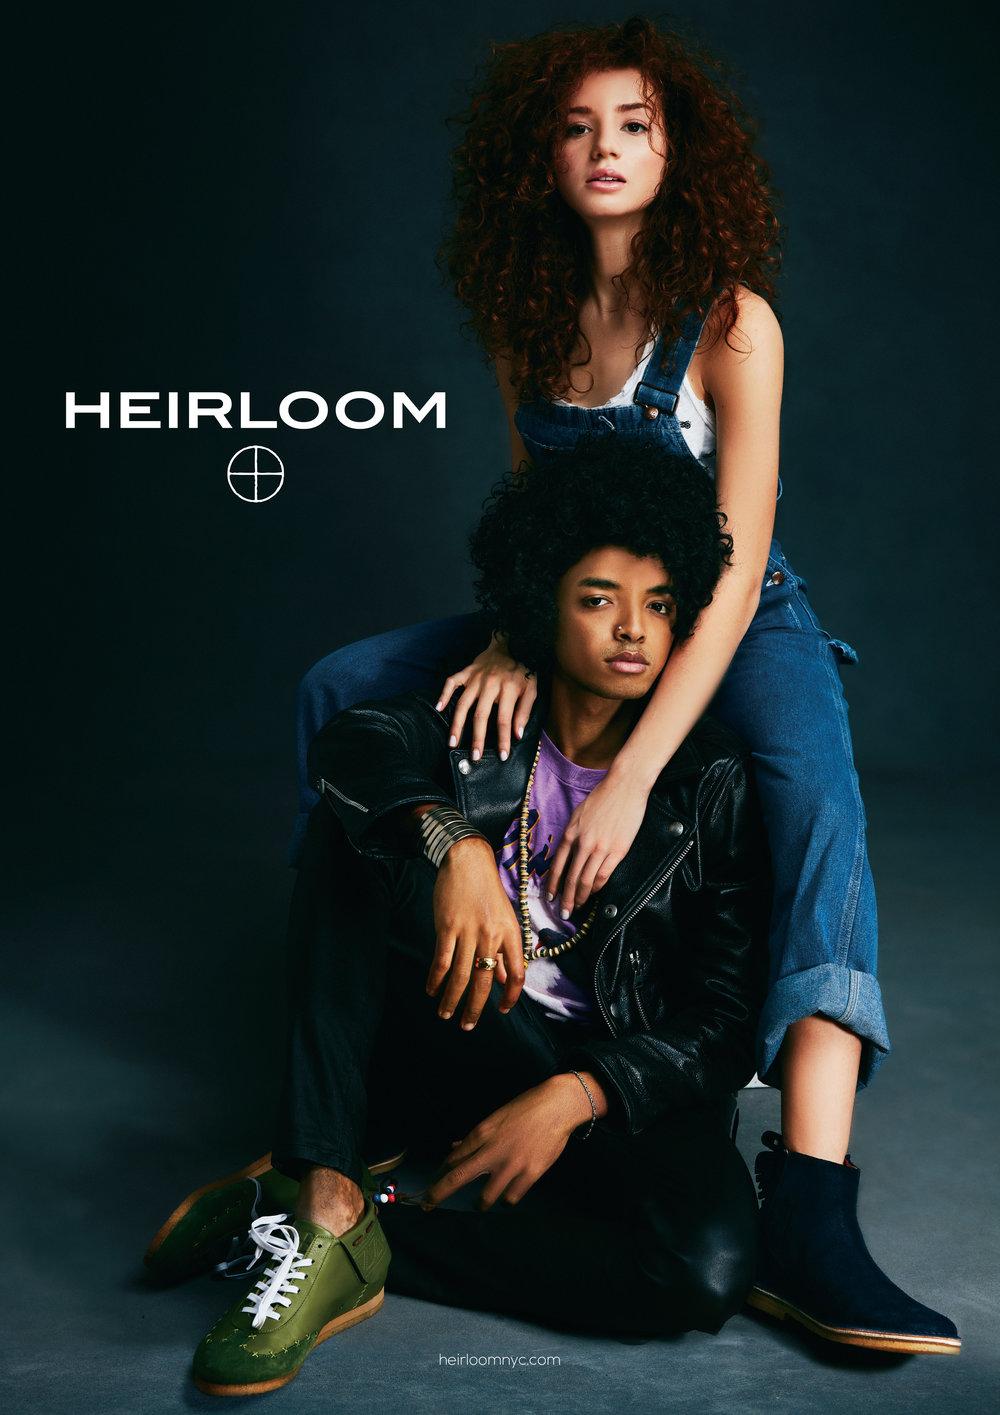 HEIRLOOM_COOL_AMRC_V2.jpg